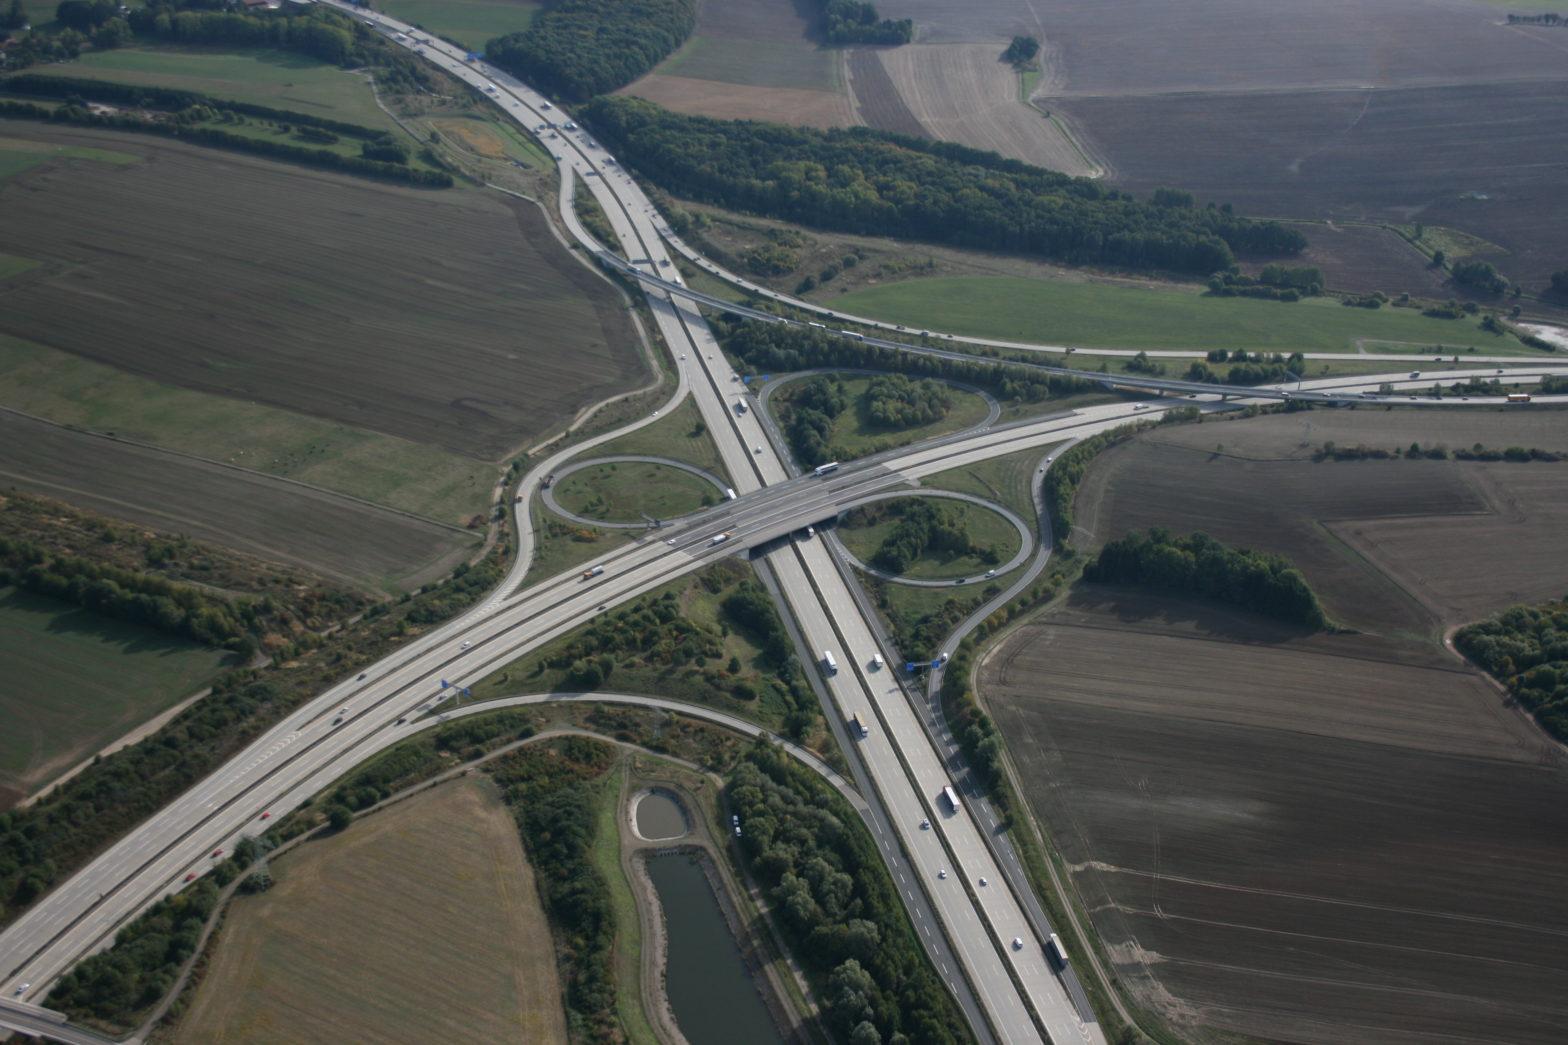 Autobahnkreuz Chemnitz